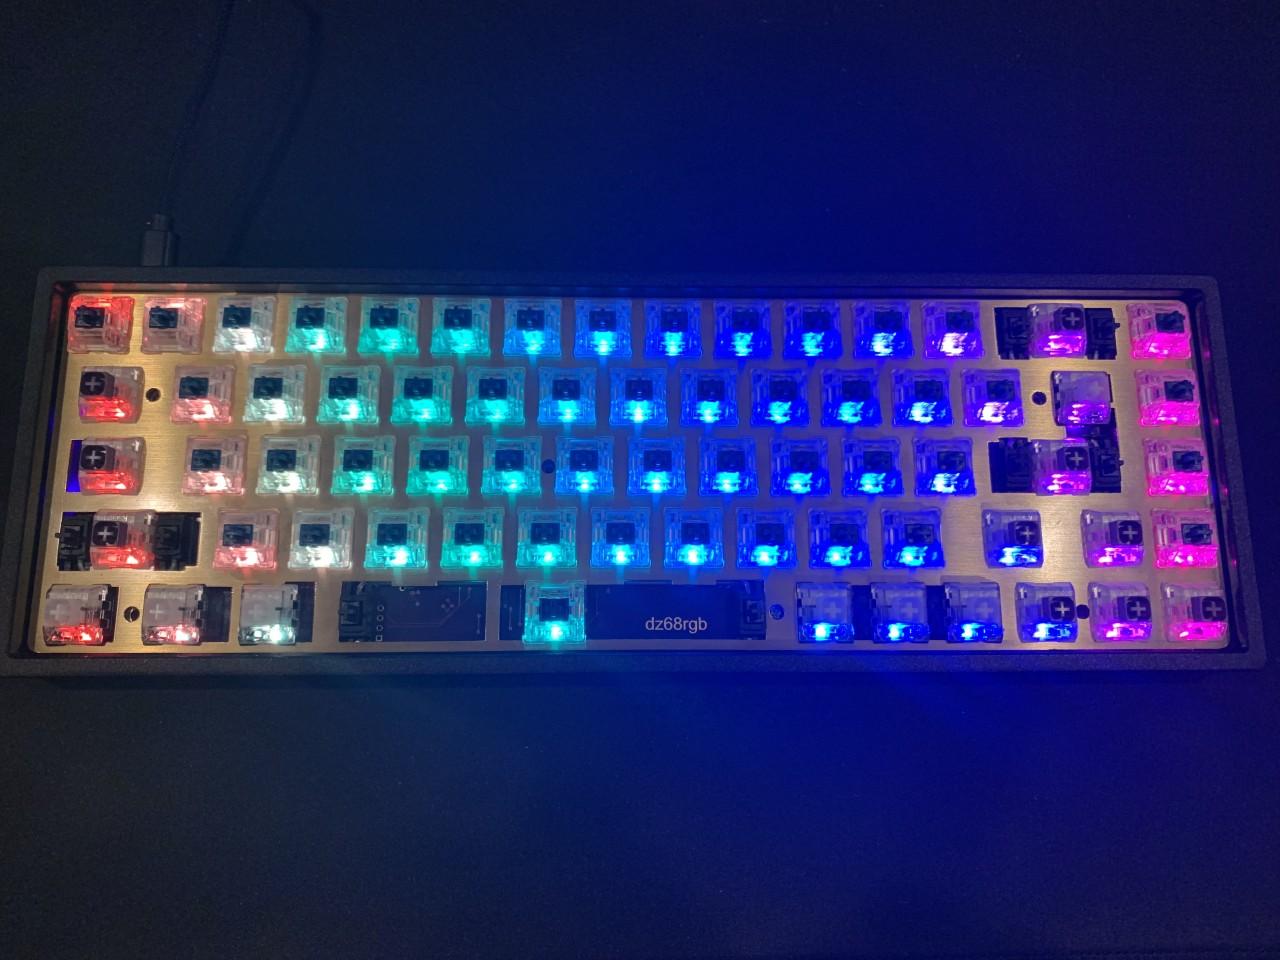 RGB LEDs working